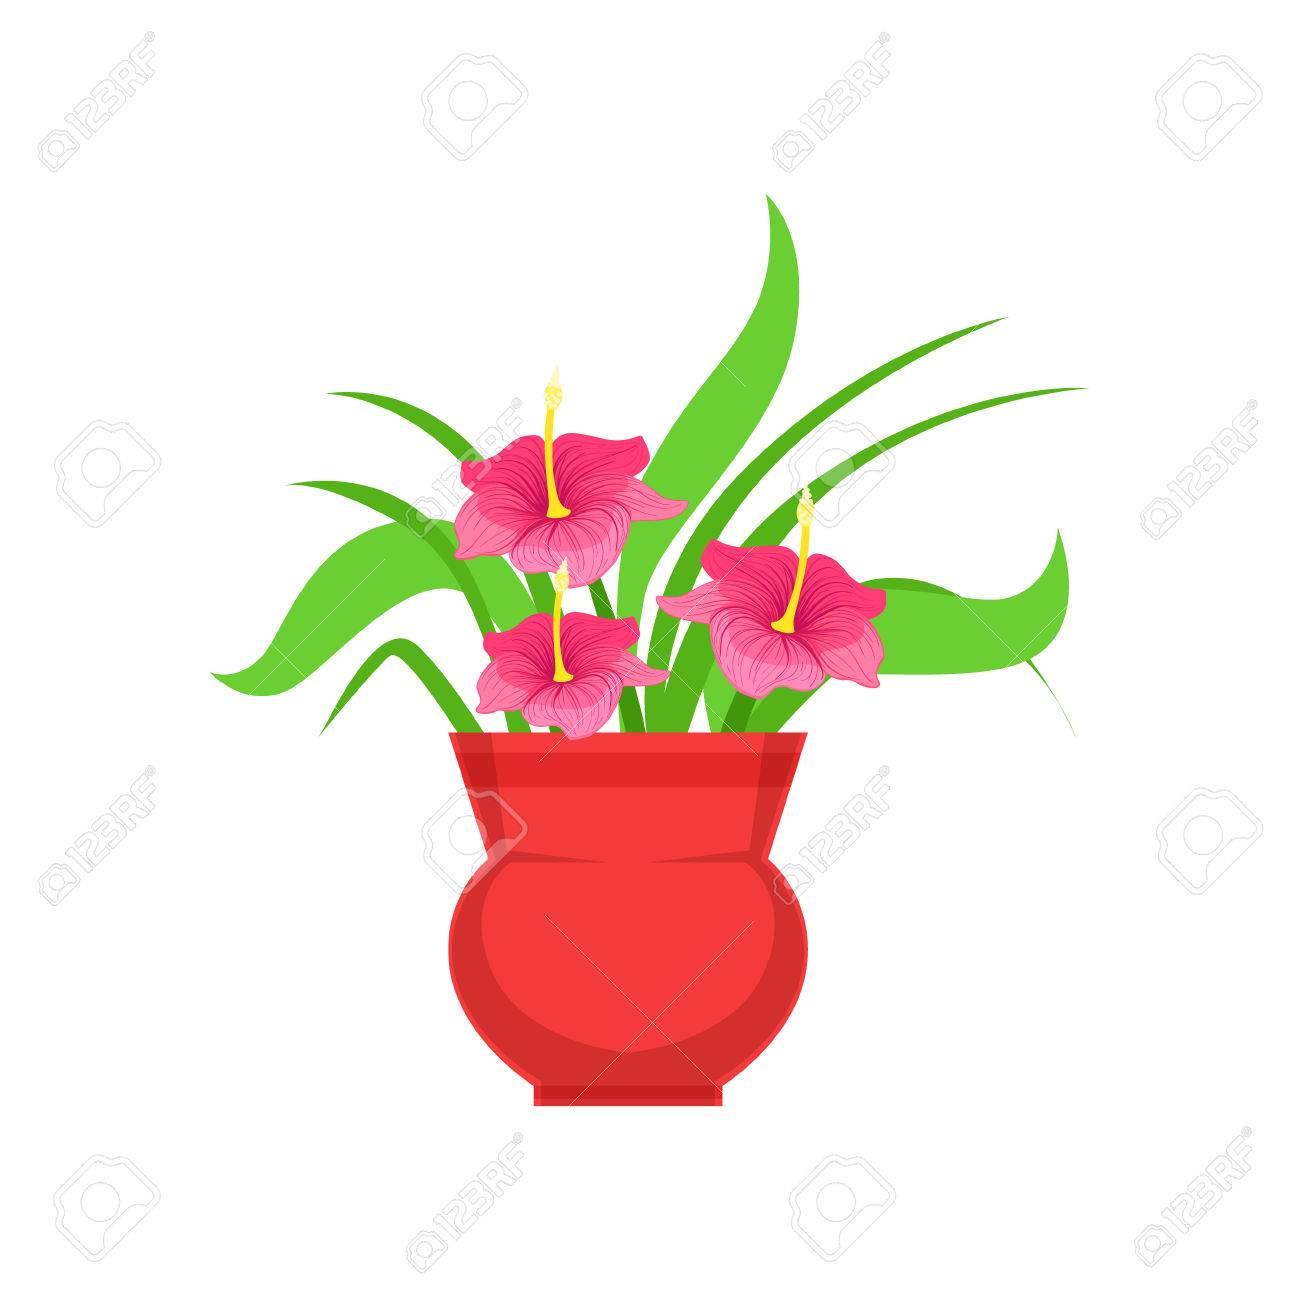 Home Hibiscus Flower In The Flowerpot Flower Shop Decorative